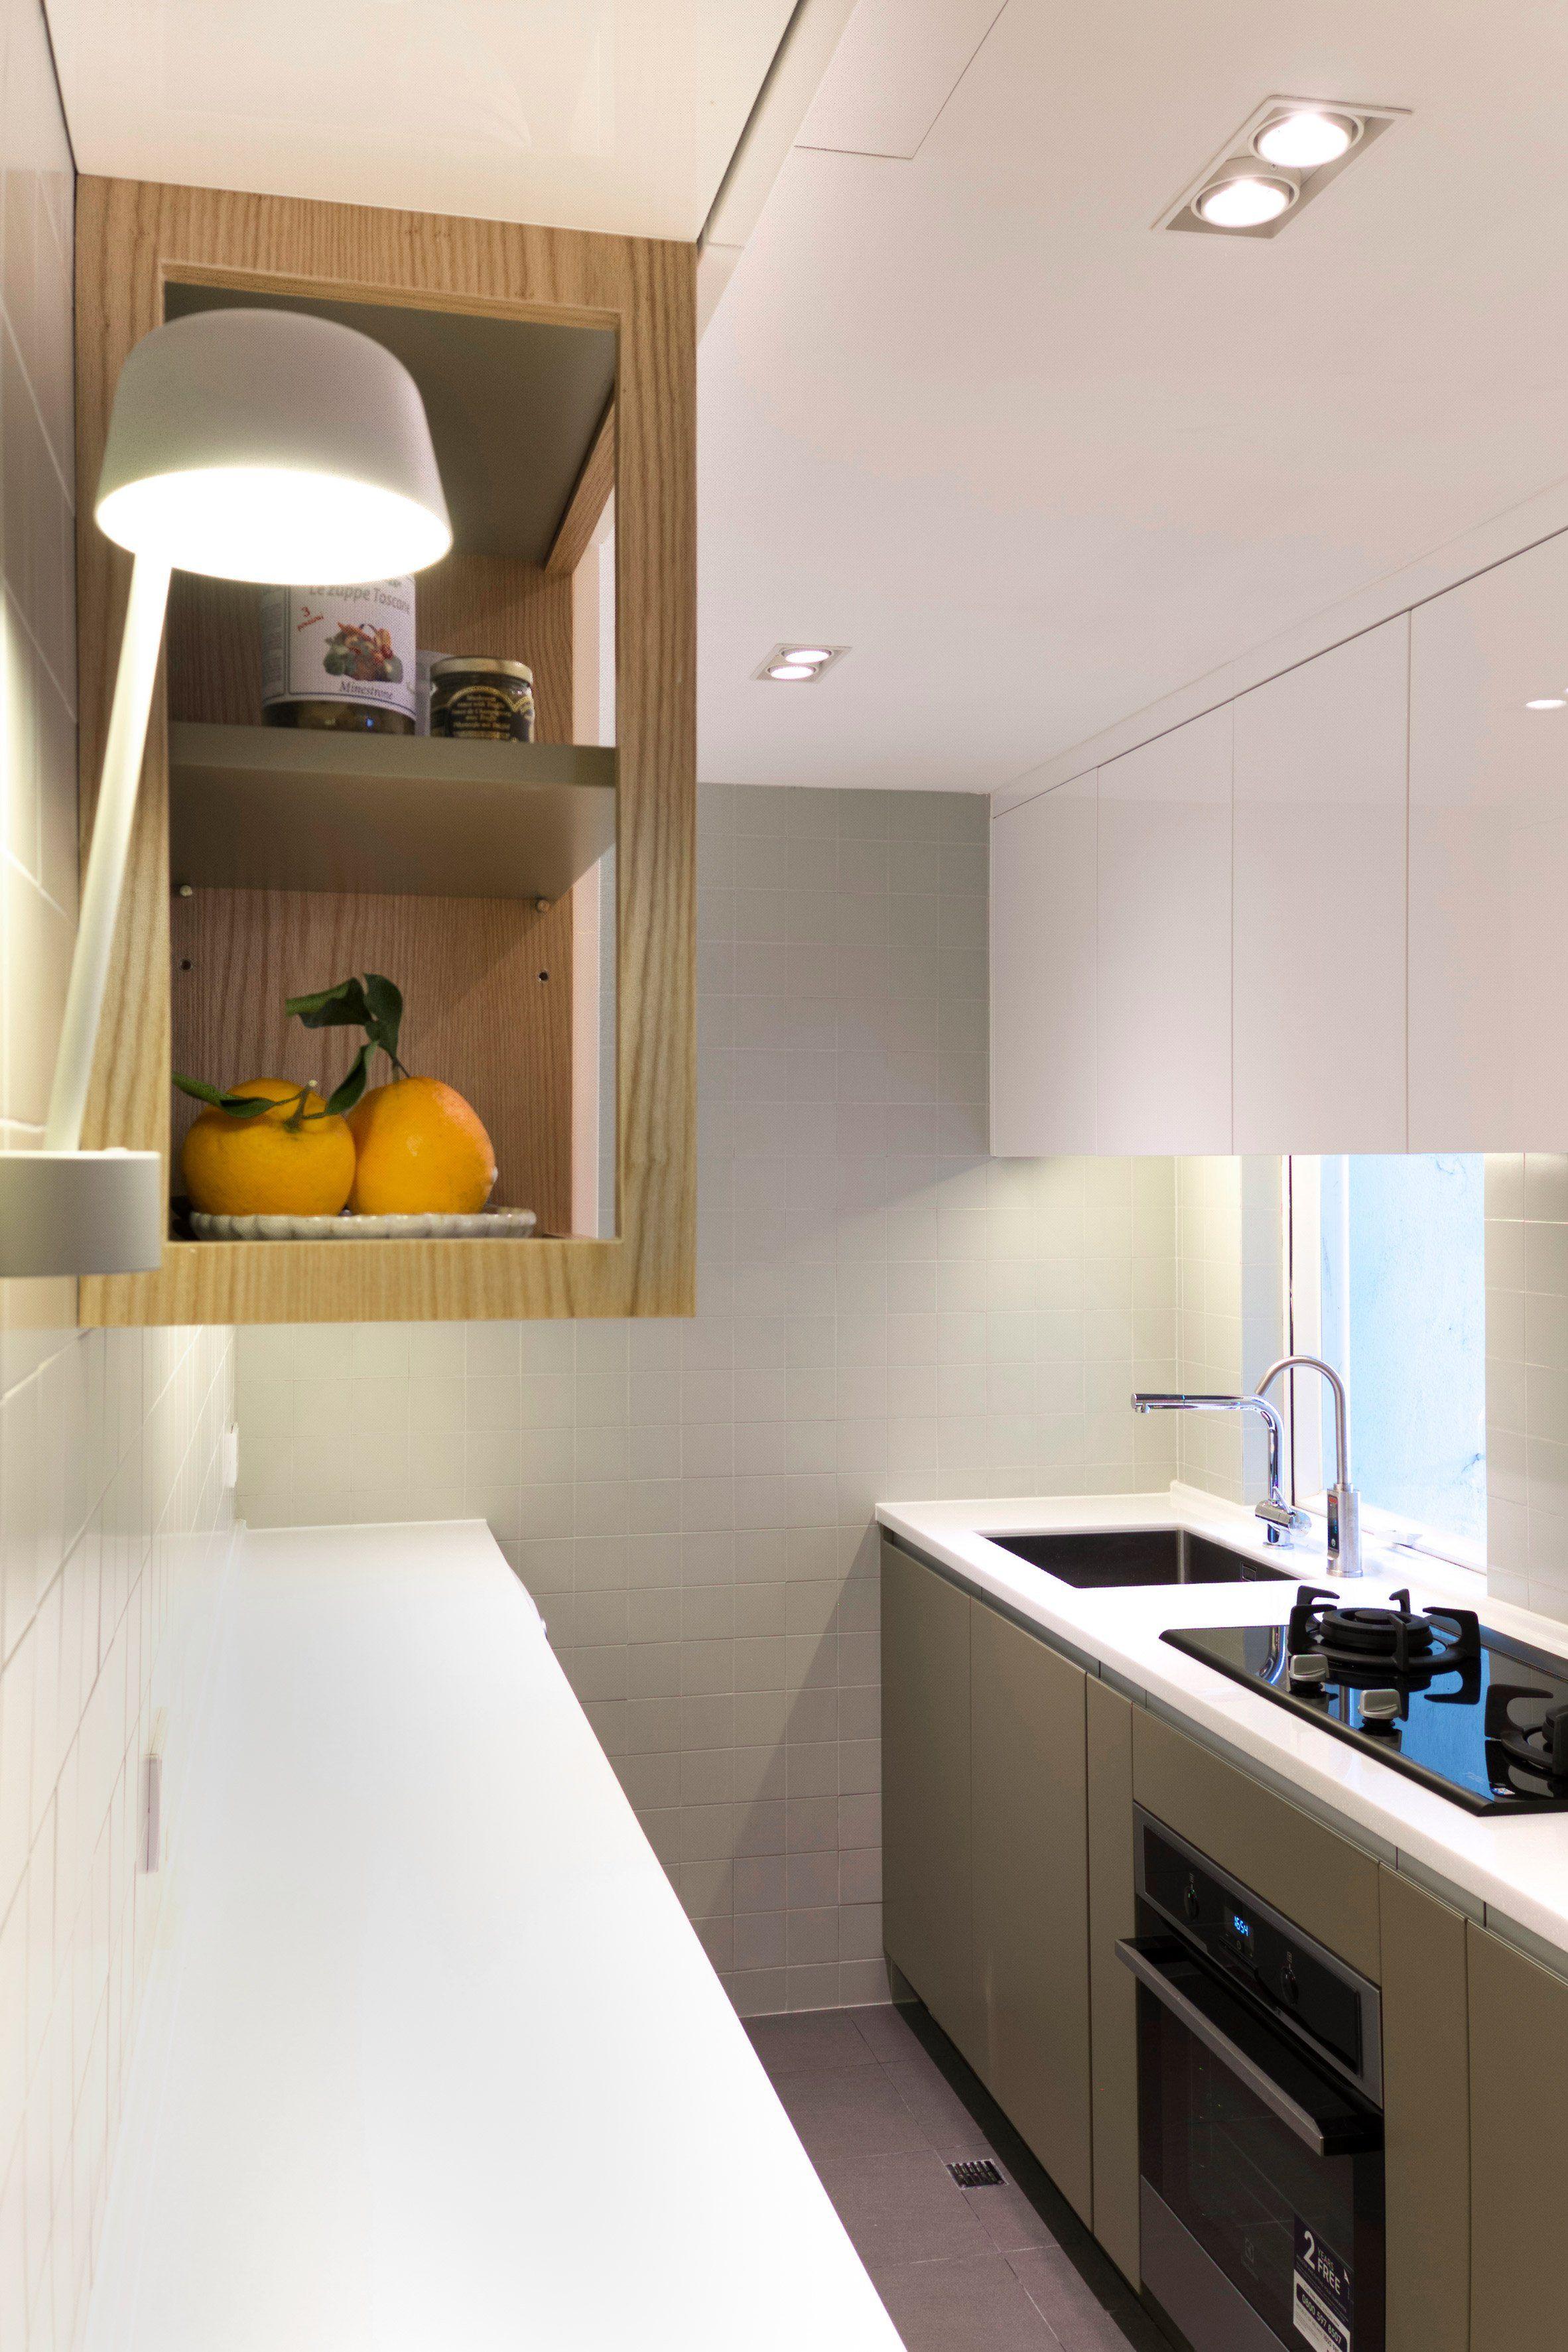 flat 27a by design eight five two (deft) hong kong | interiors